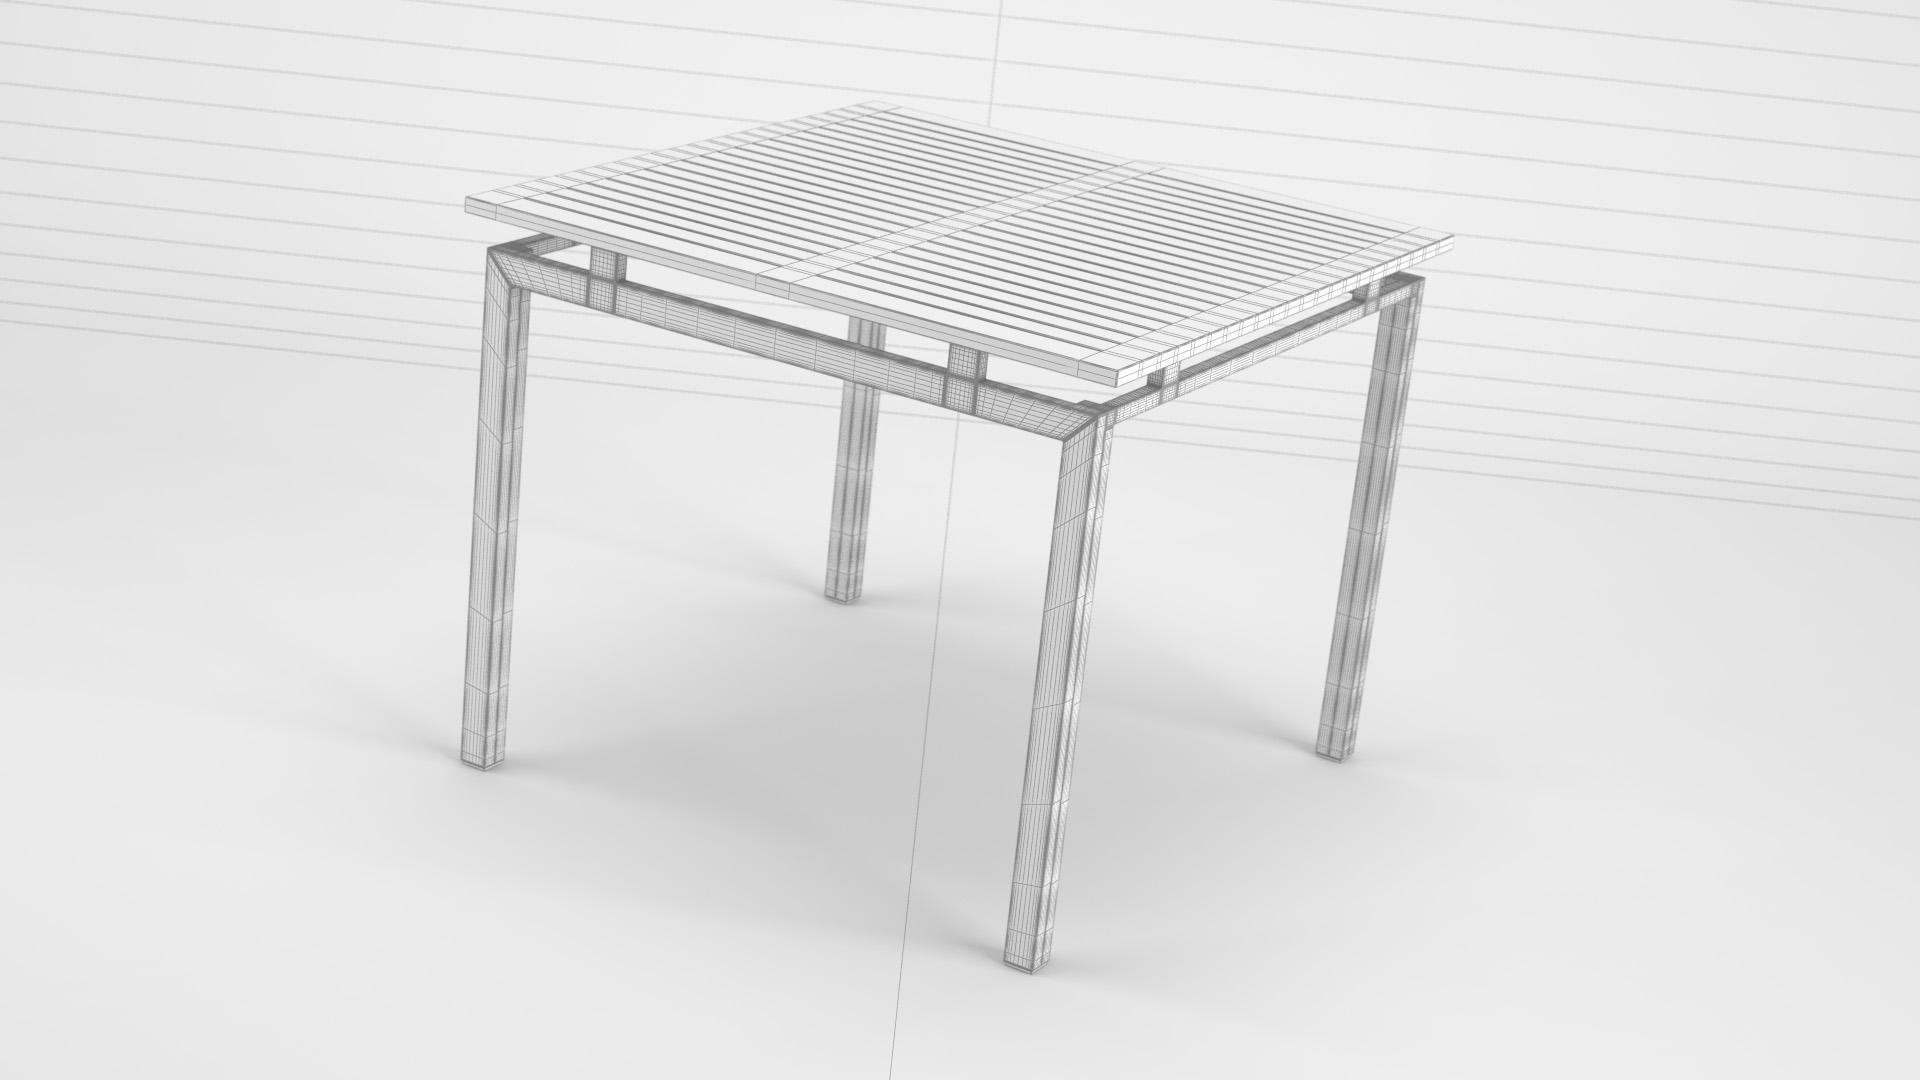 Alu_WoodGarden_Table_WhiteSet_01_wire_0003